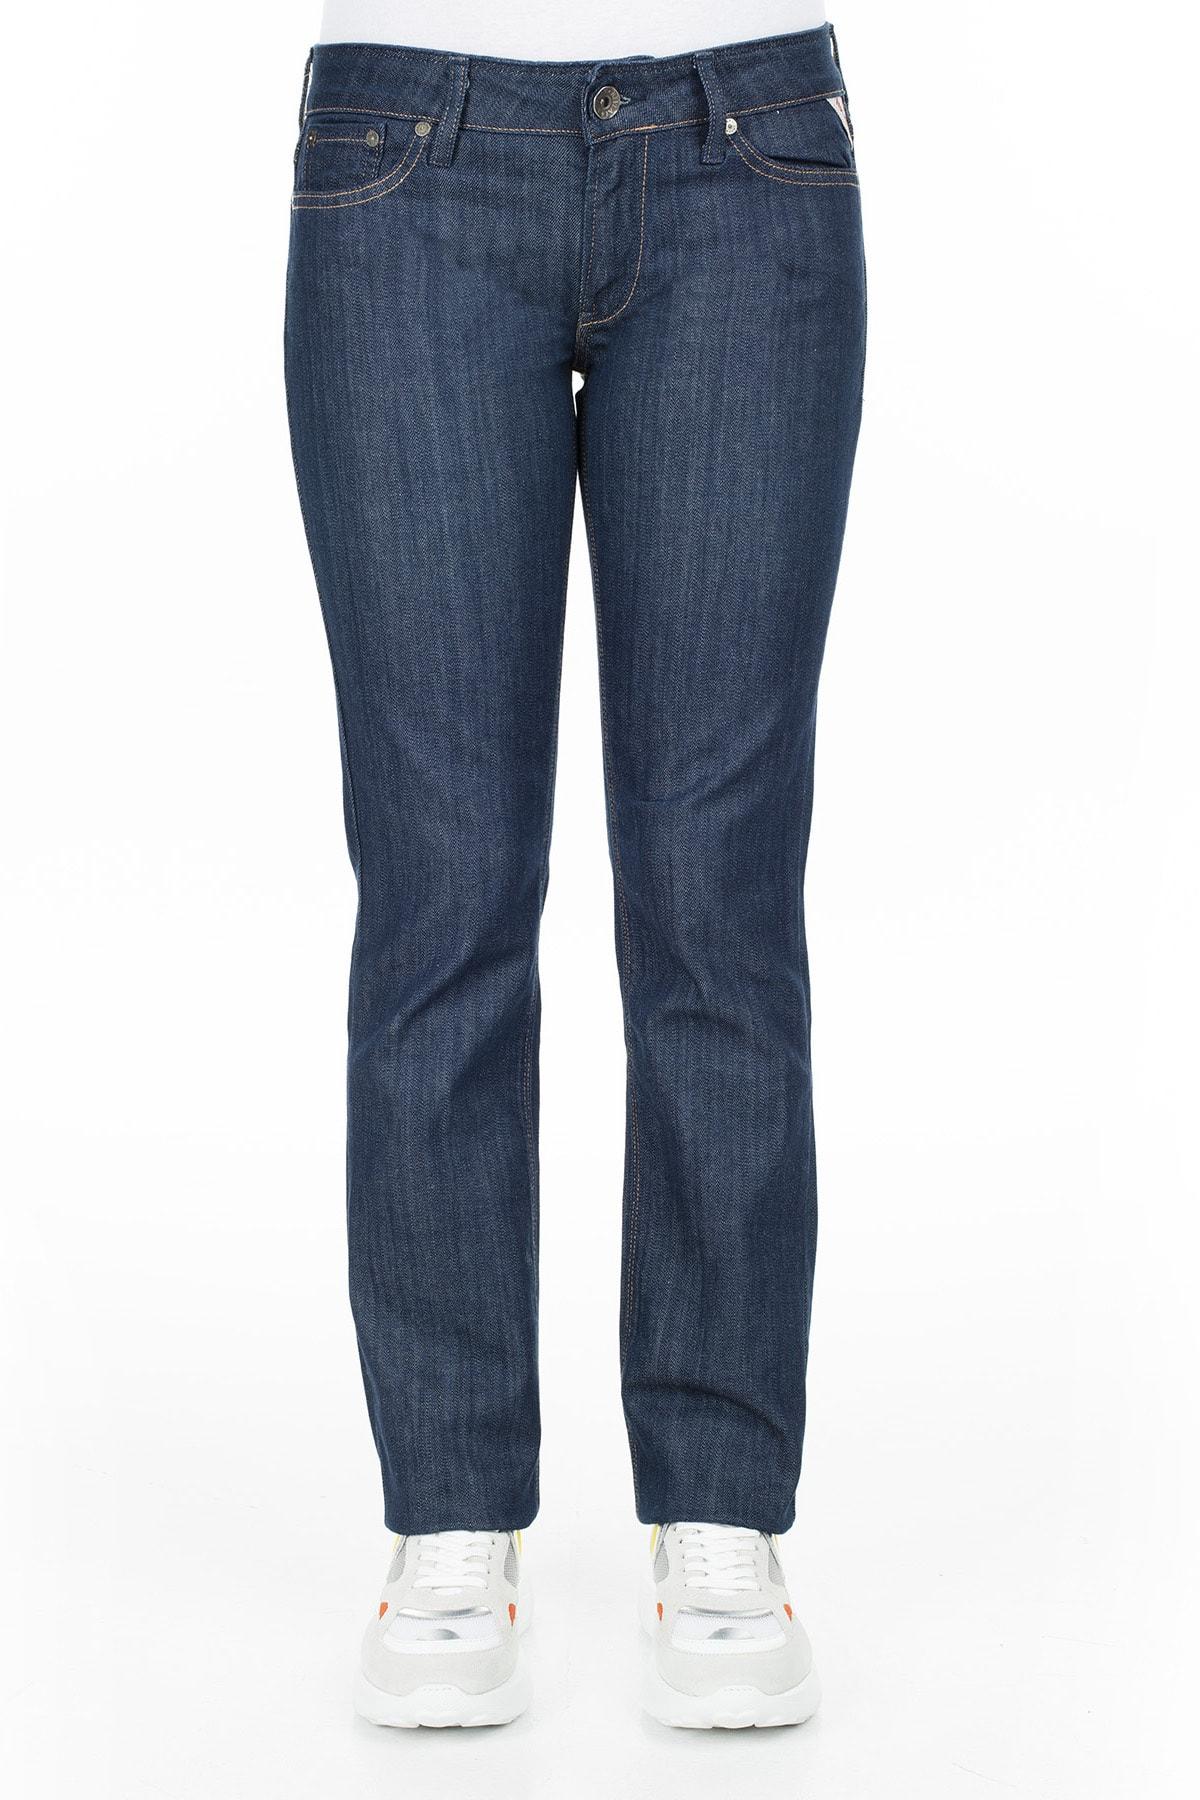 Replay Jeans Kadın Kot Pantolon Zoxwv591 1